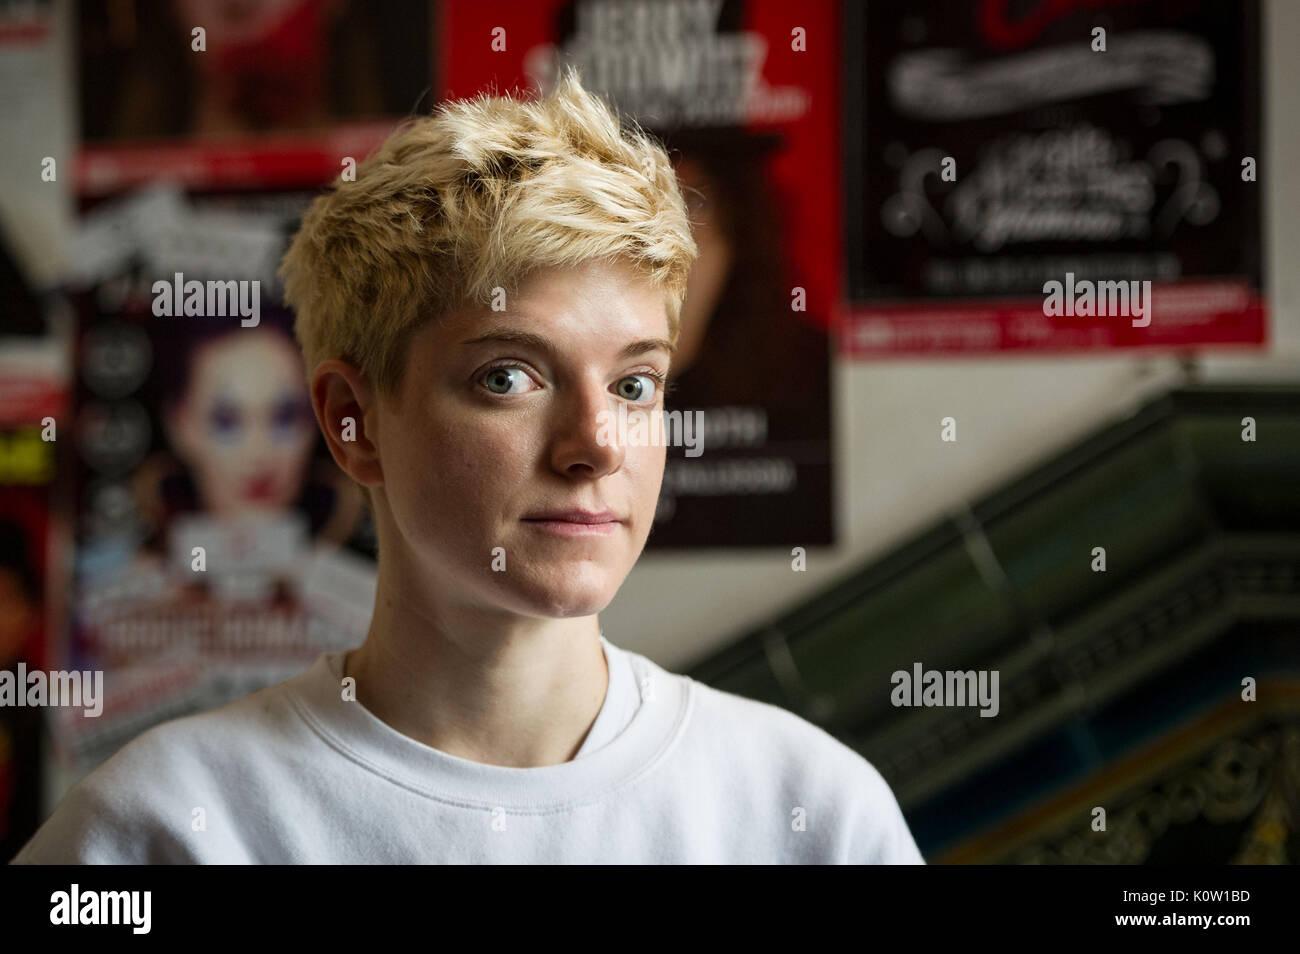 Edinburgh, UK. 24th Aug, 2017. Edinburgh Comedy Awards, Best Comedy Show nominees. Pictured Mae Martin: Dope. Credit: Steven Scott Taylor/Alamy Live News